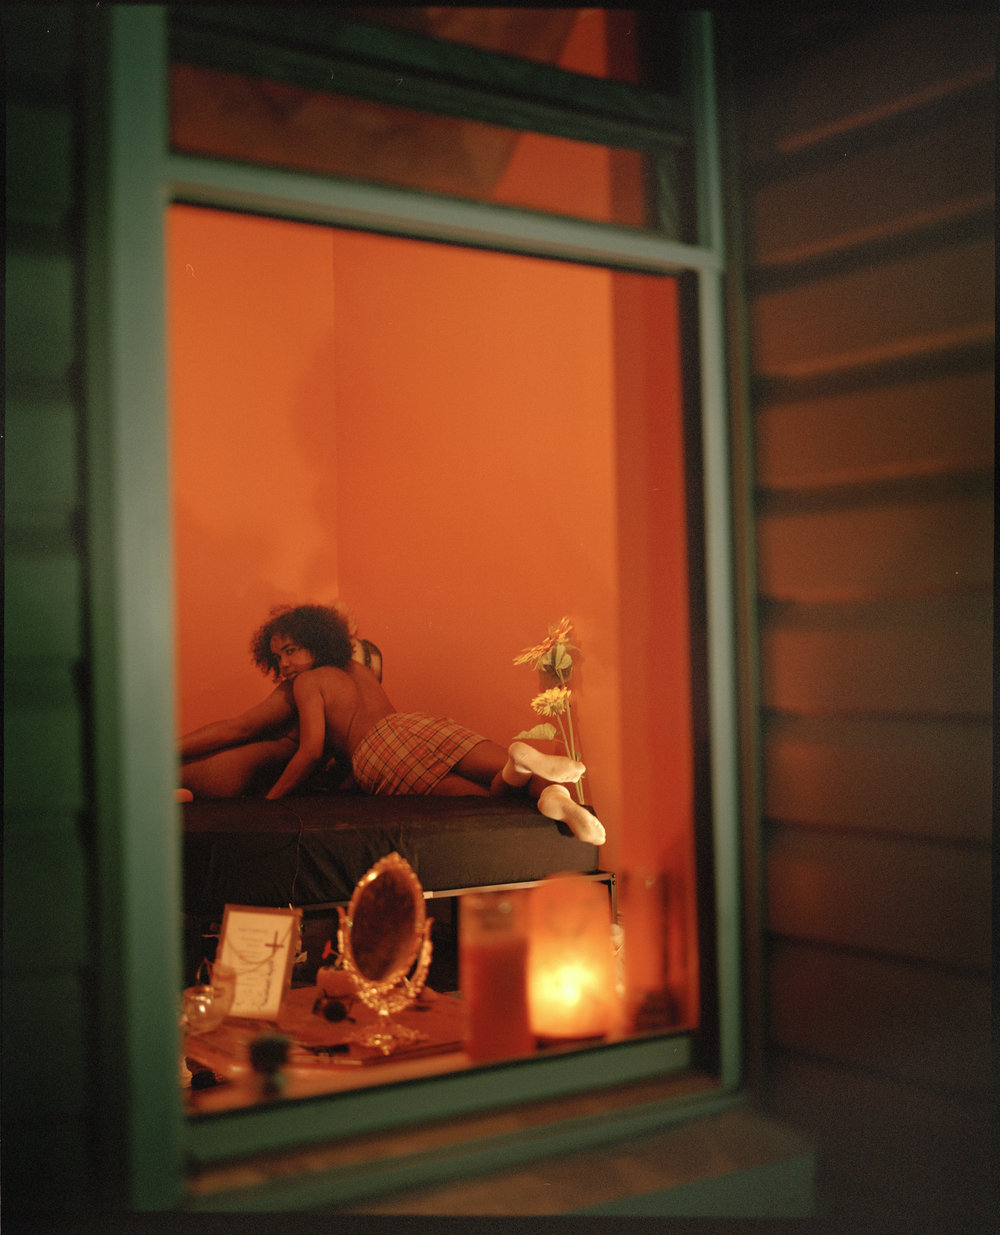 Jheyda McGarrell  Let you in last night , 2018